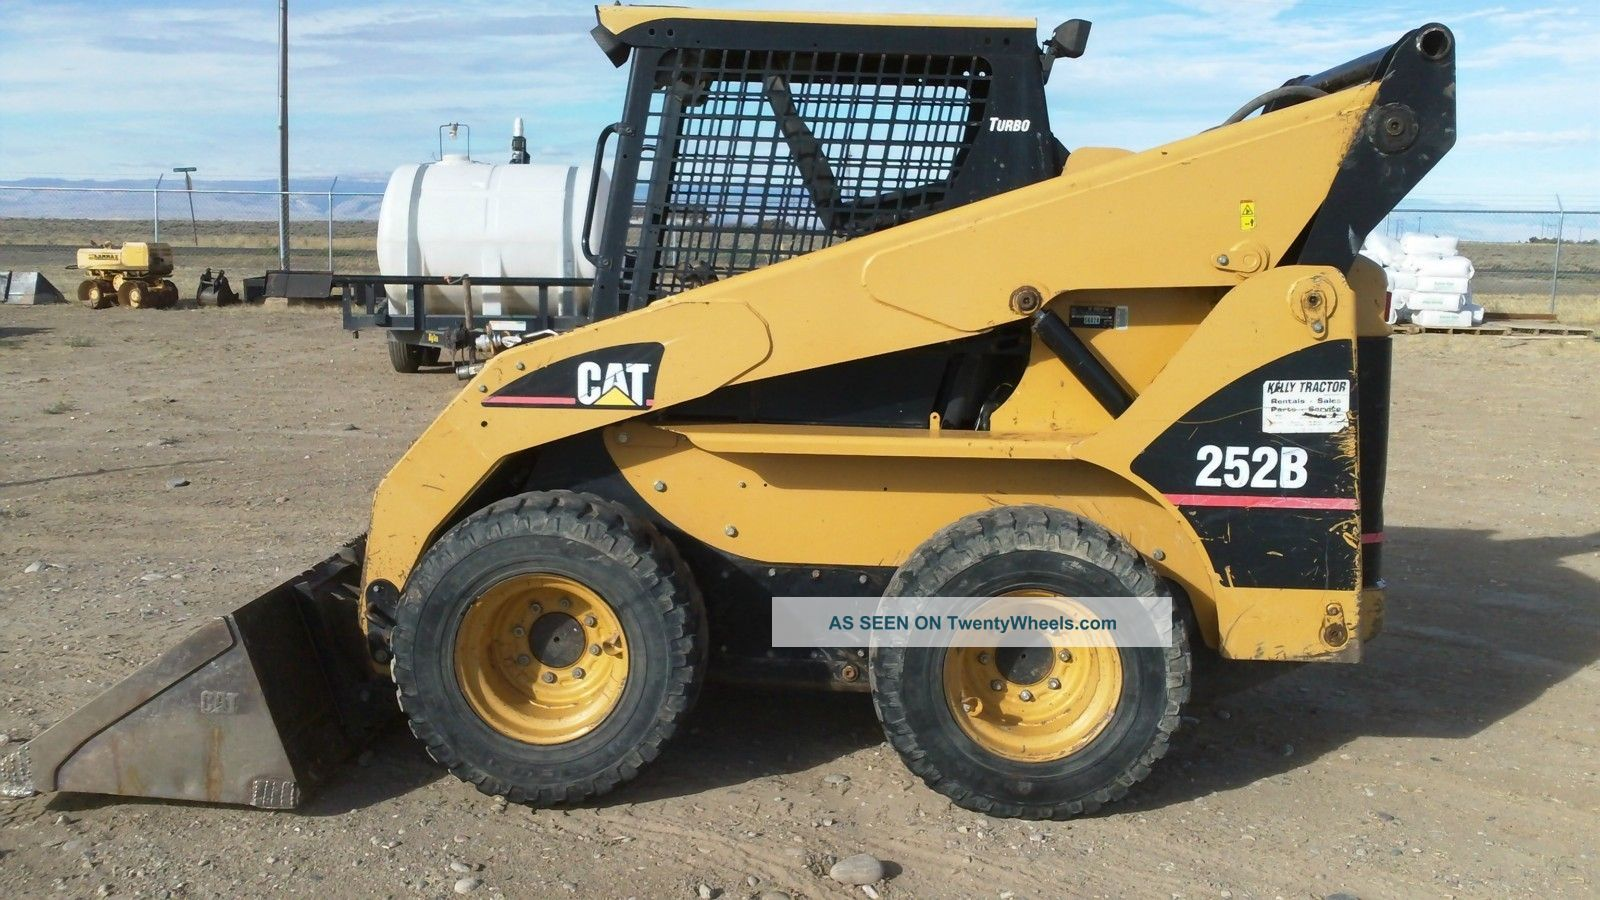 Cat 252b Skid Steer